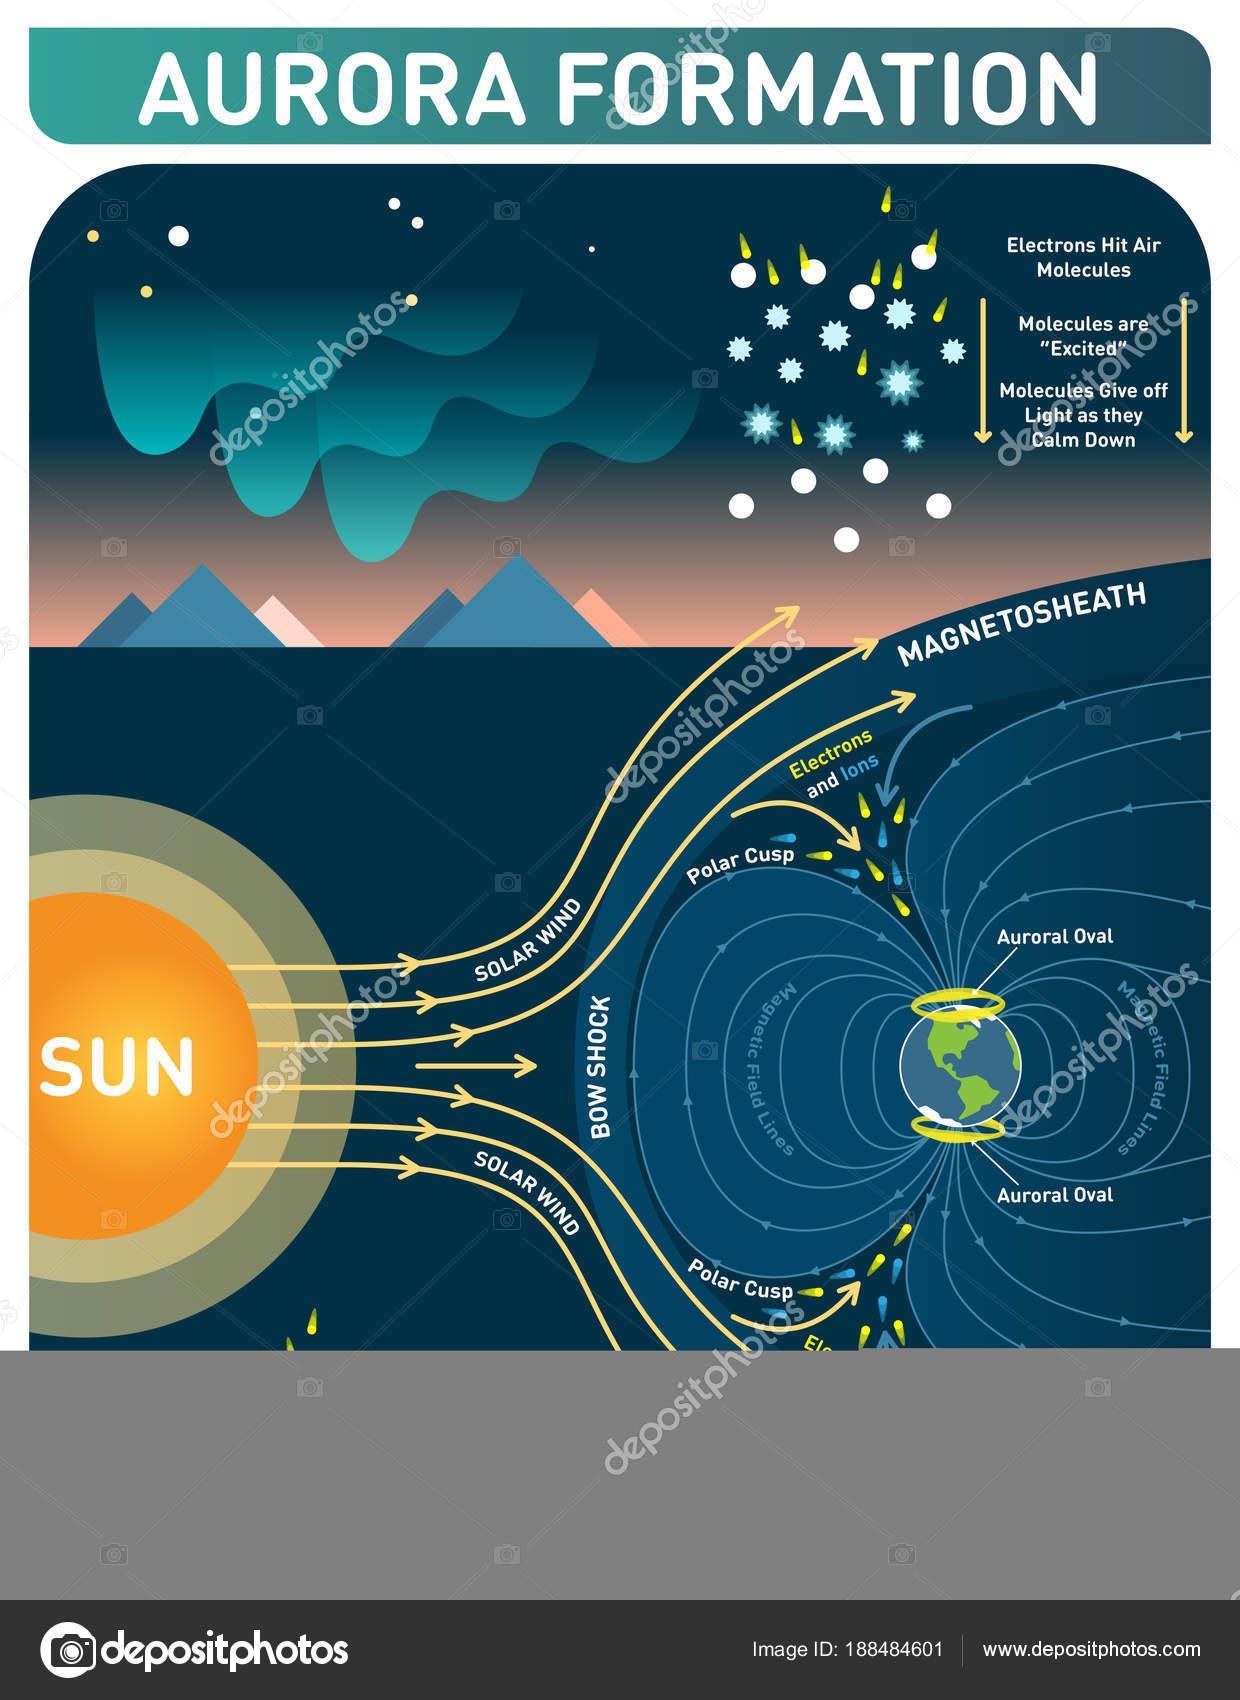 diagram of aurora diagram data schema Aurora Borealis Formation diagram of aurora wiring diagram imp diagram of aurora australis aurora formation scientific cosmology infopgraphic poster